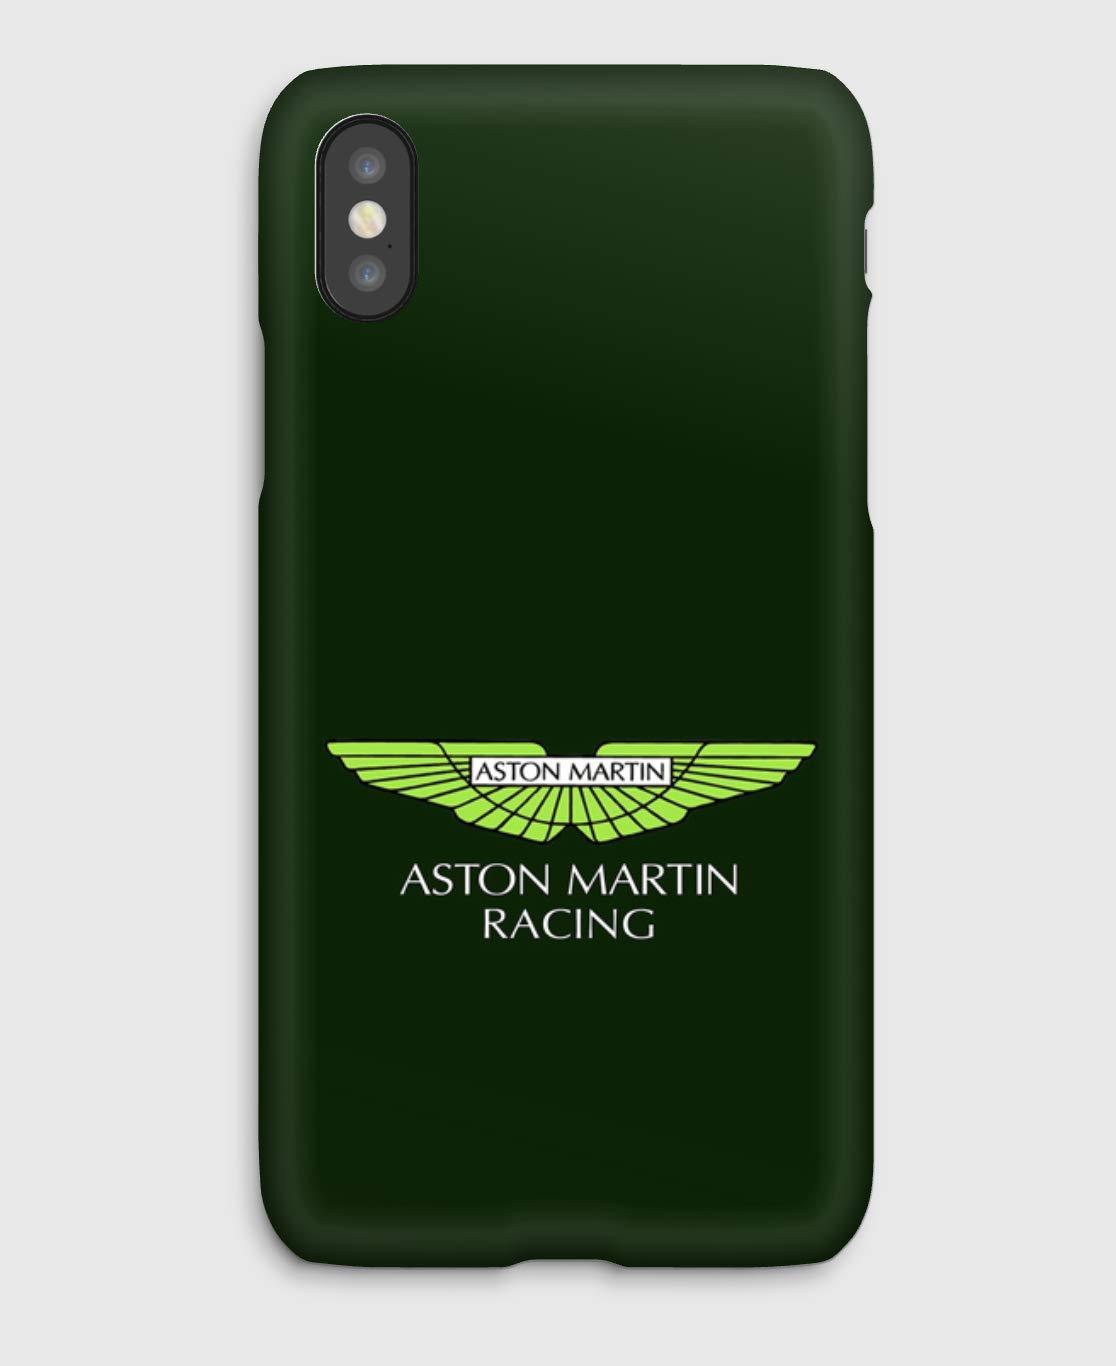 Aston Martin, coque pour iPhone XS, XS Max, XR, X, 8, 8+, 7, 7+, 6S, 6, 6S+, 6+, 5C, 5, 5S, 5SE, 4S, 4,